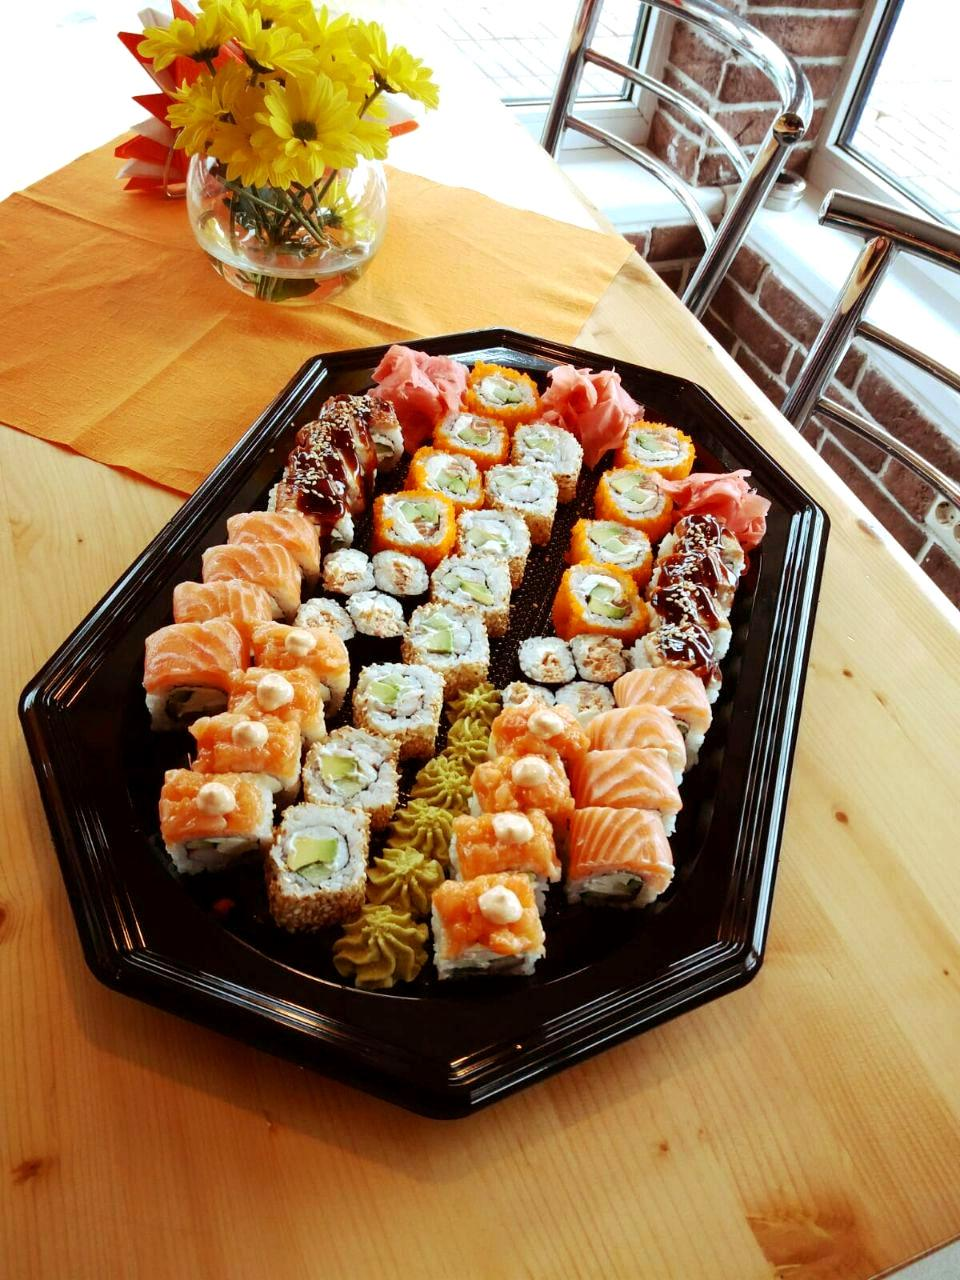 Sushi Station Cafe Liepaja Restaurant Reviews Places liepaja restaurantasian restaurantjapanese restaurantsushi restaurant sushi station. sushi station cafe liepaja